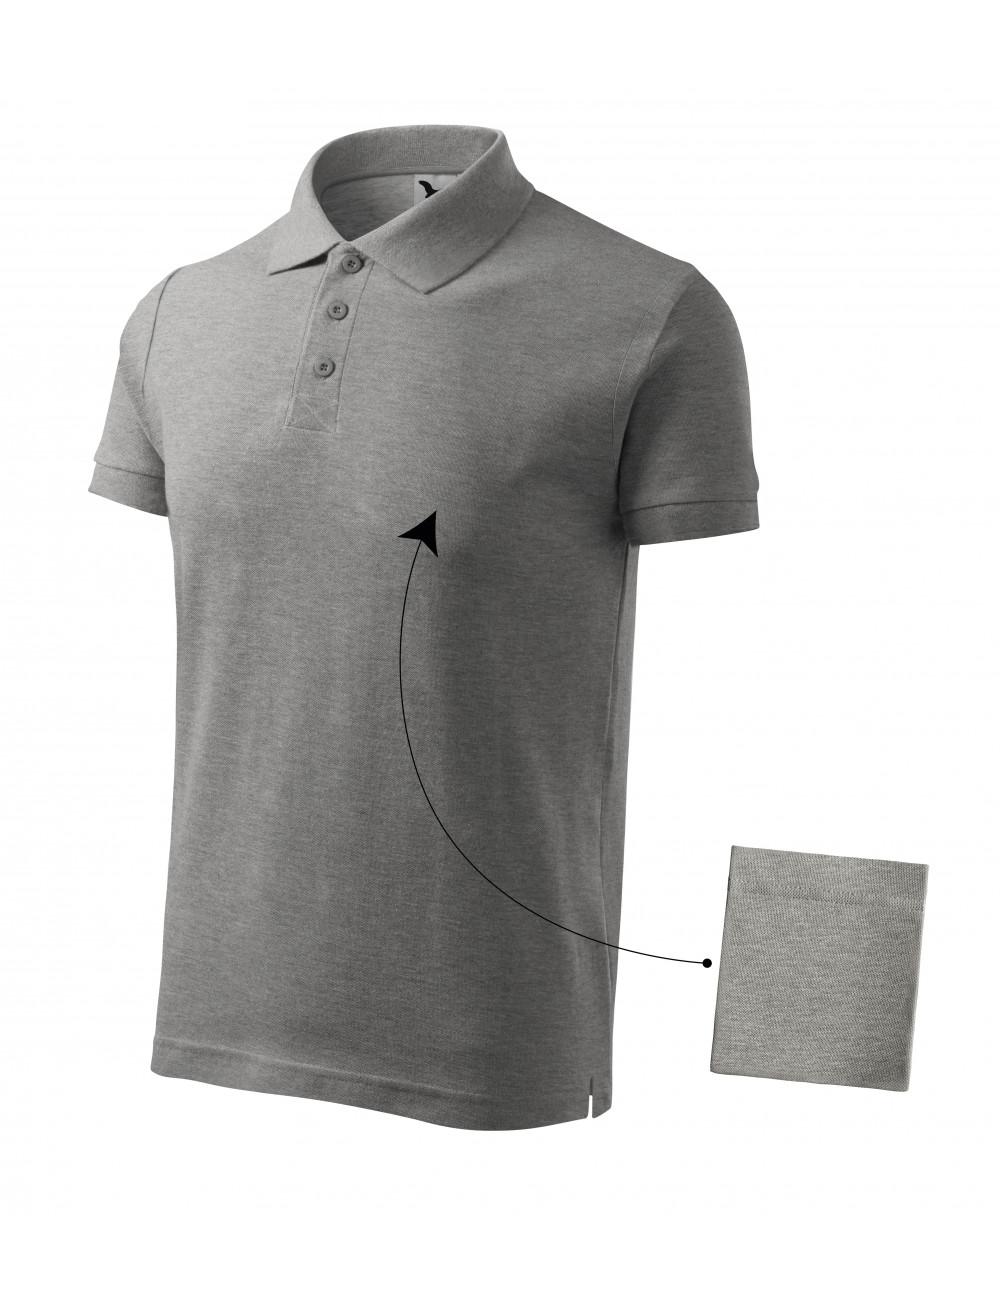 Adler MALFINI Koszulka polo męska Cotton 212 ciemnoszary melanż